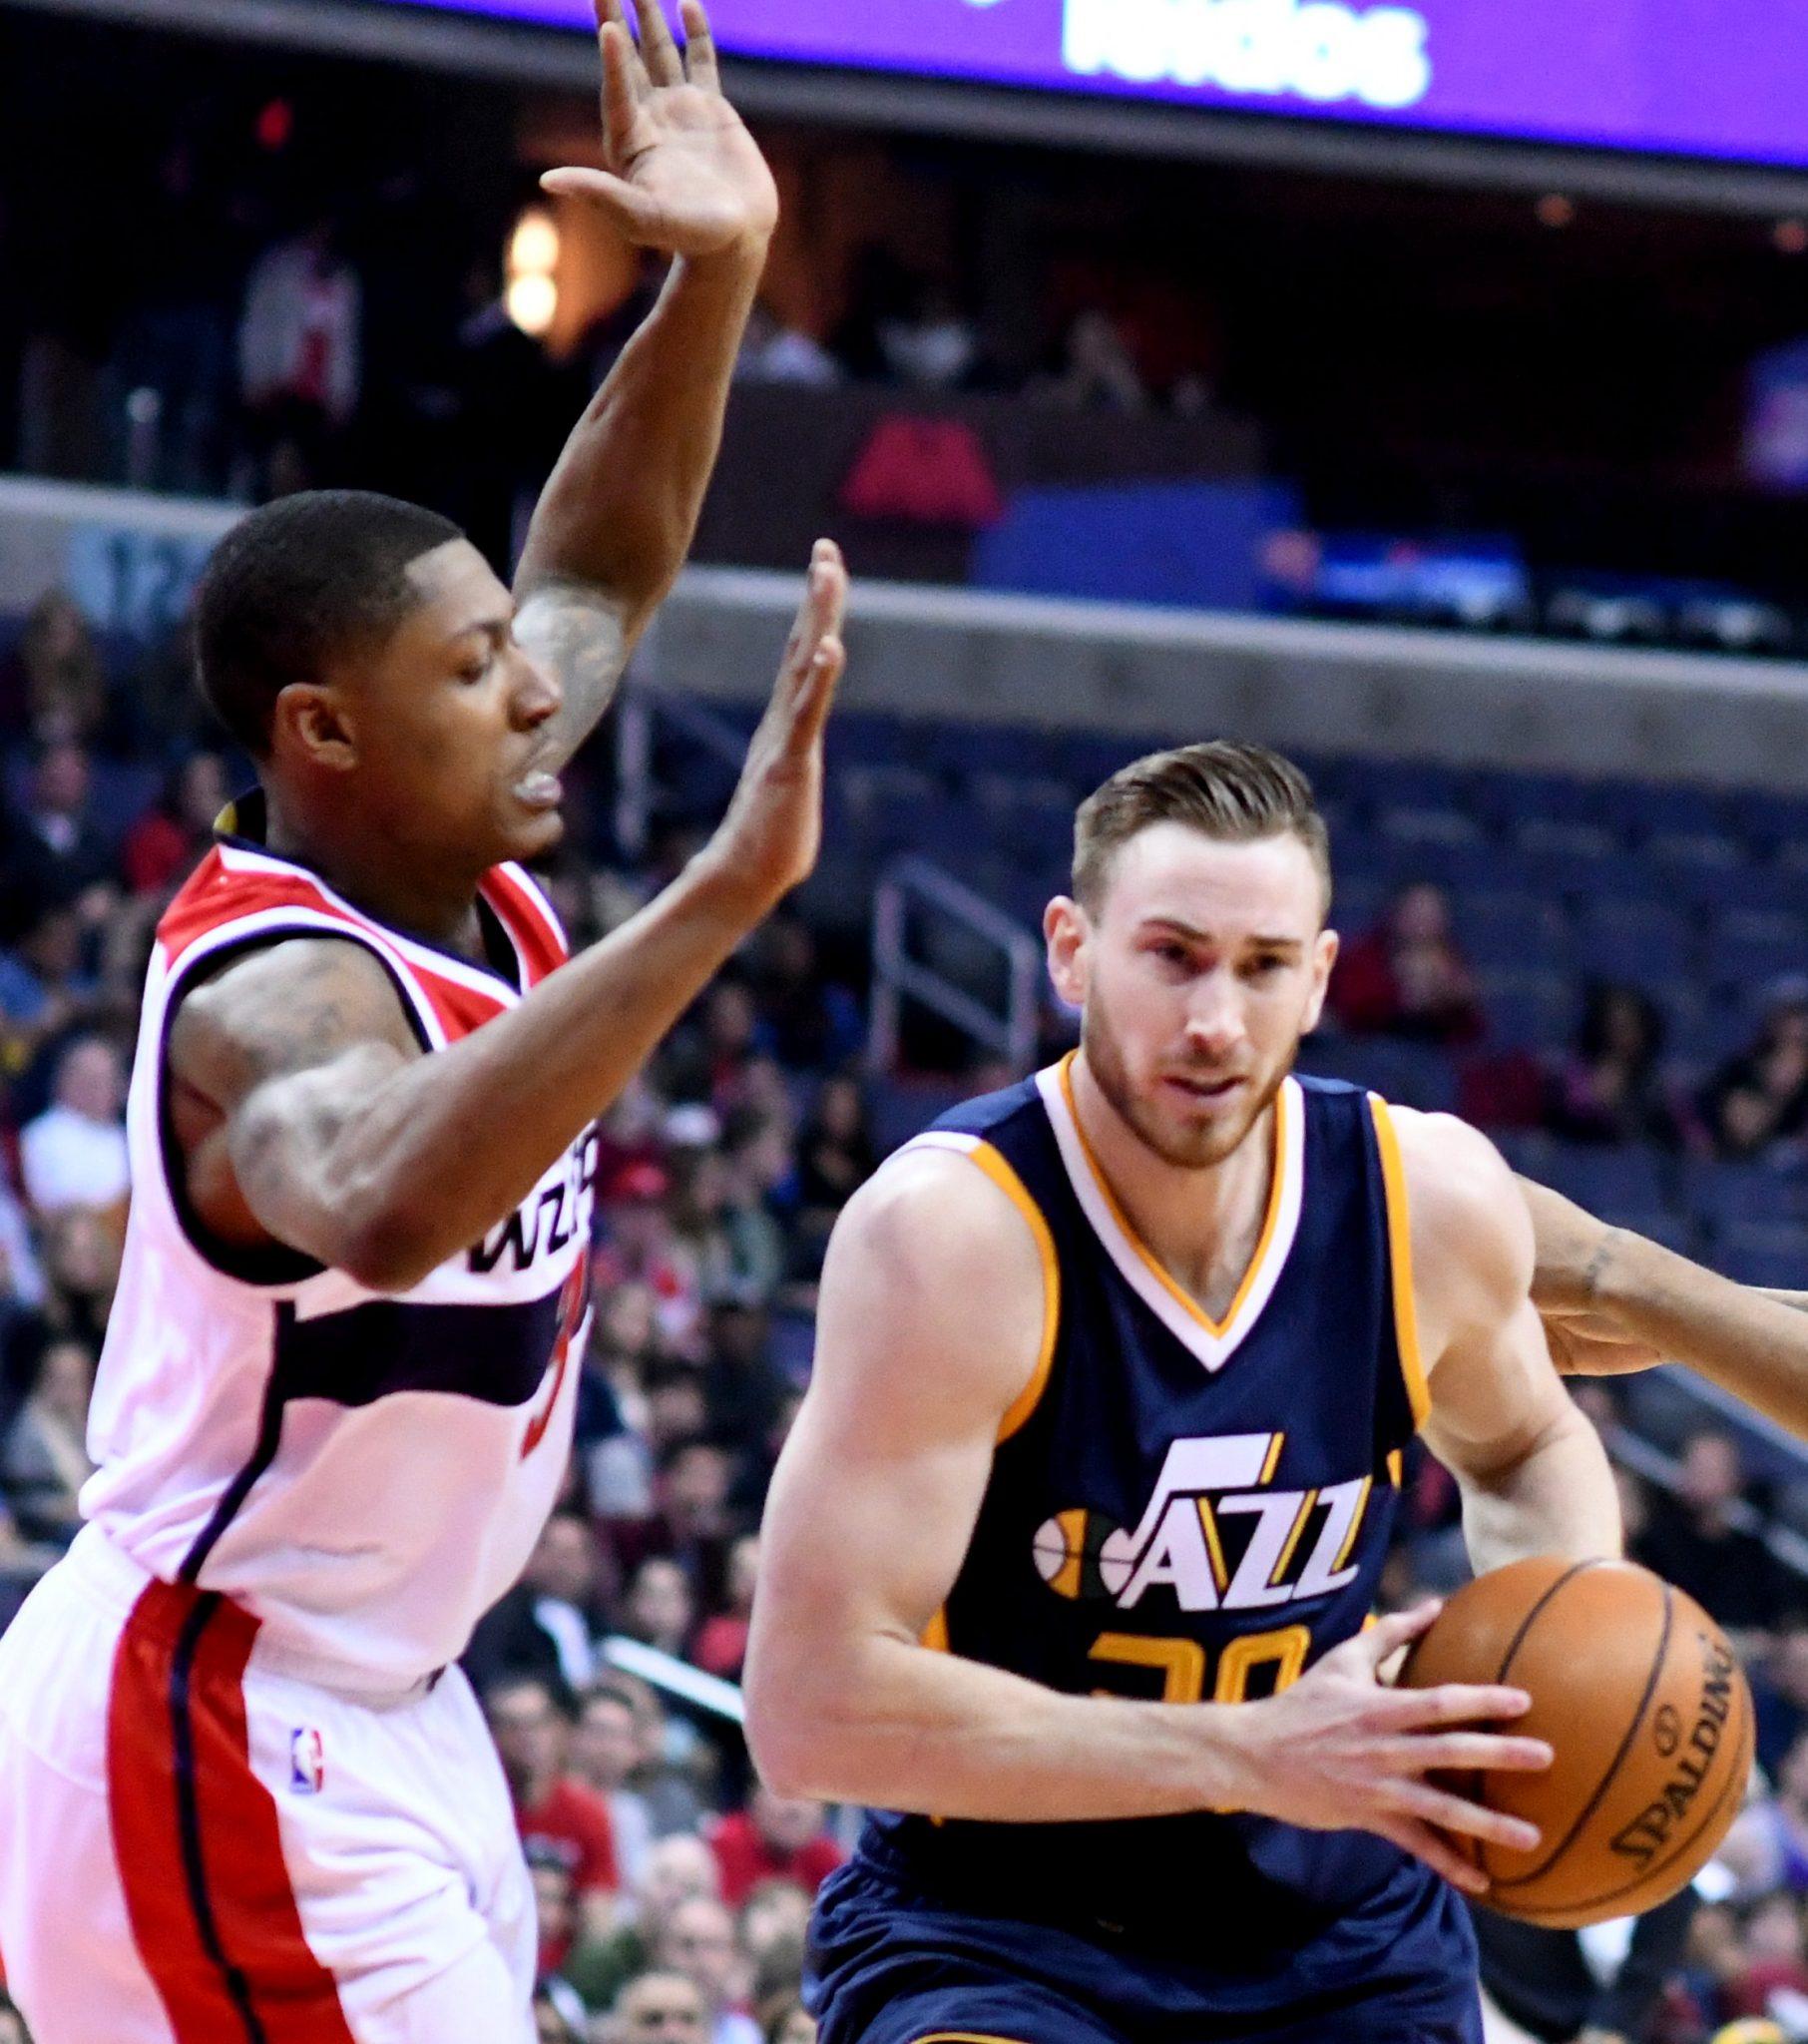 Utah Jazz forward Gordon Hayward drives to the basket against Washington Wizards guard Bradley Beal in the first quarter of Utah's 102-92 win at Verizon Center in northwest D.C. on Feb. 26. (John De Freitas/The Washington Informer)